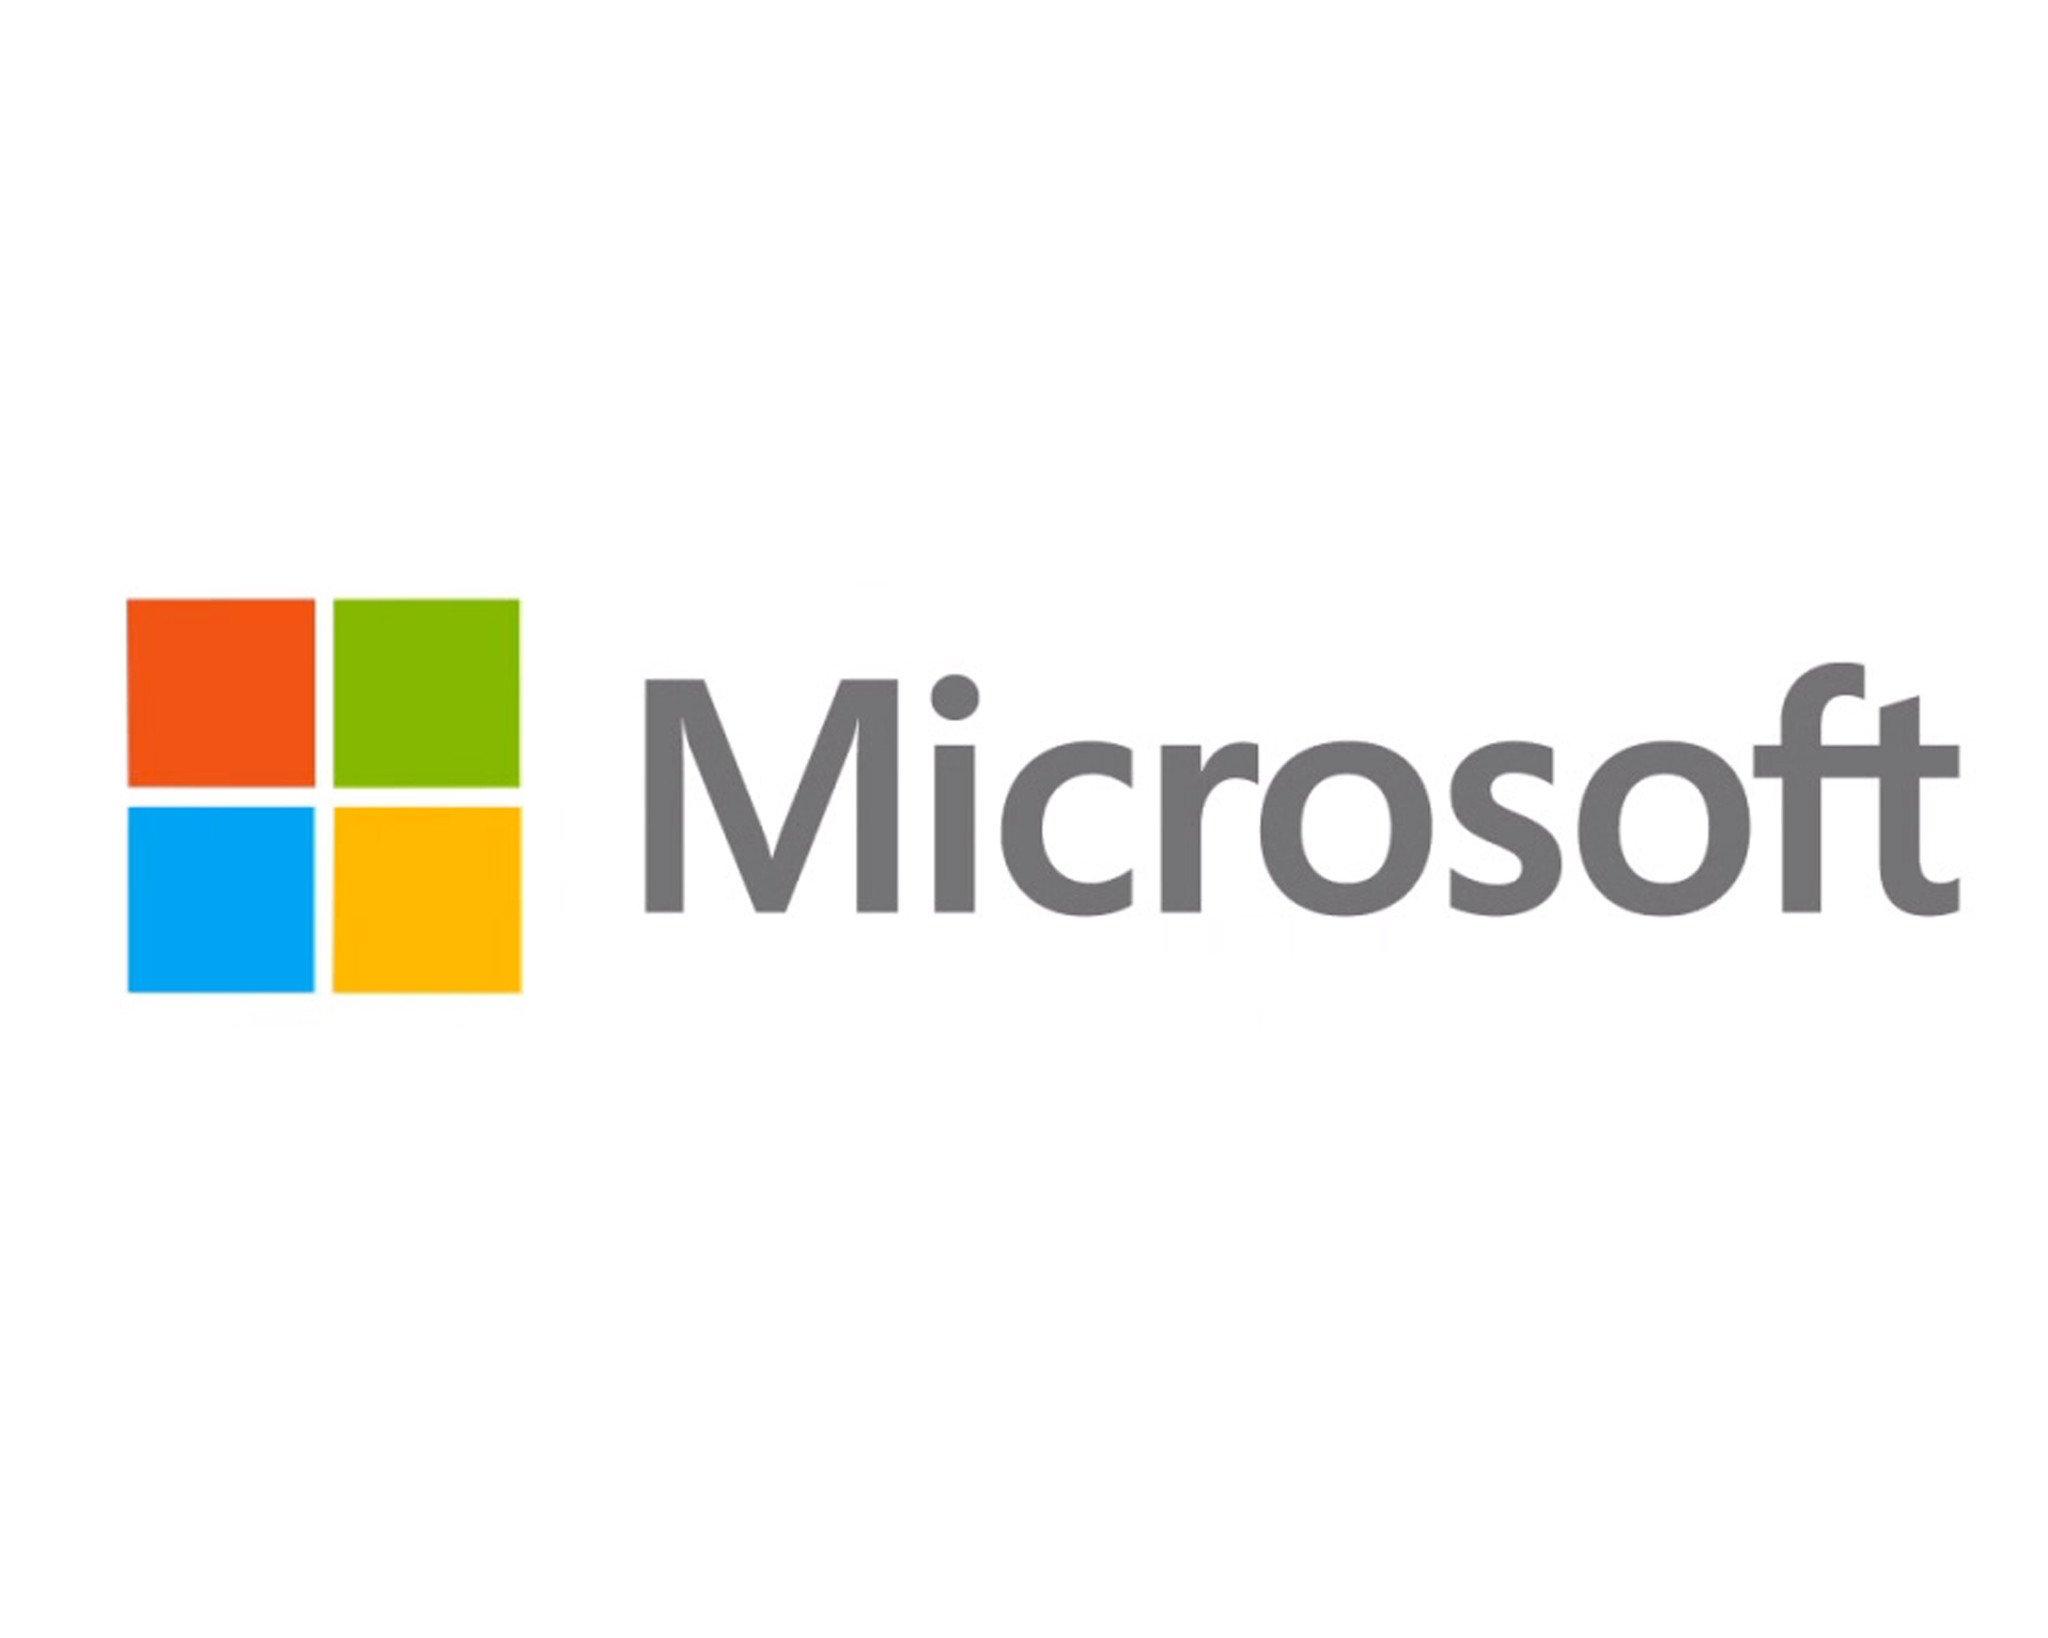 acontecimientos-clave-para-Microsoft-uh8h9n.jpeg